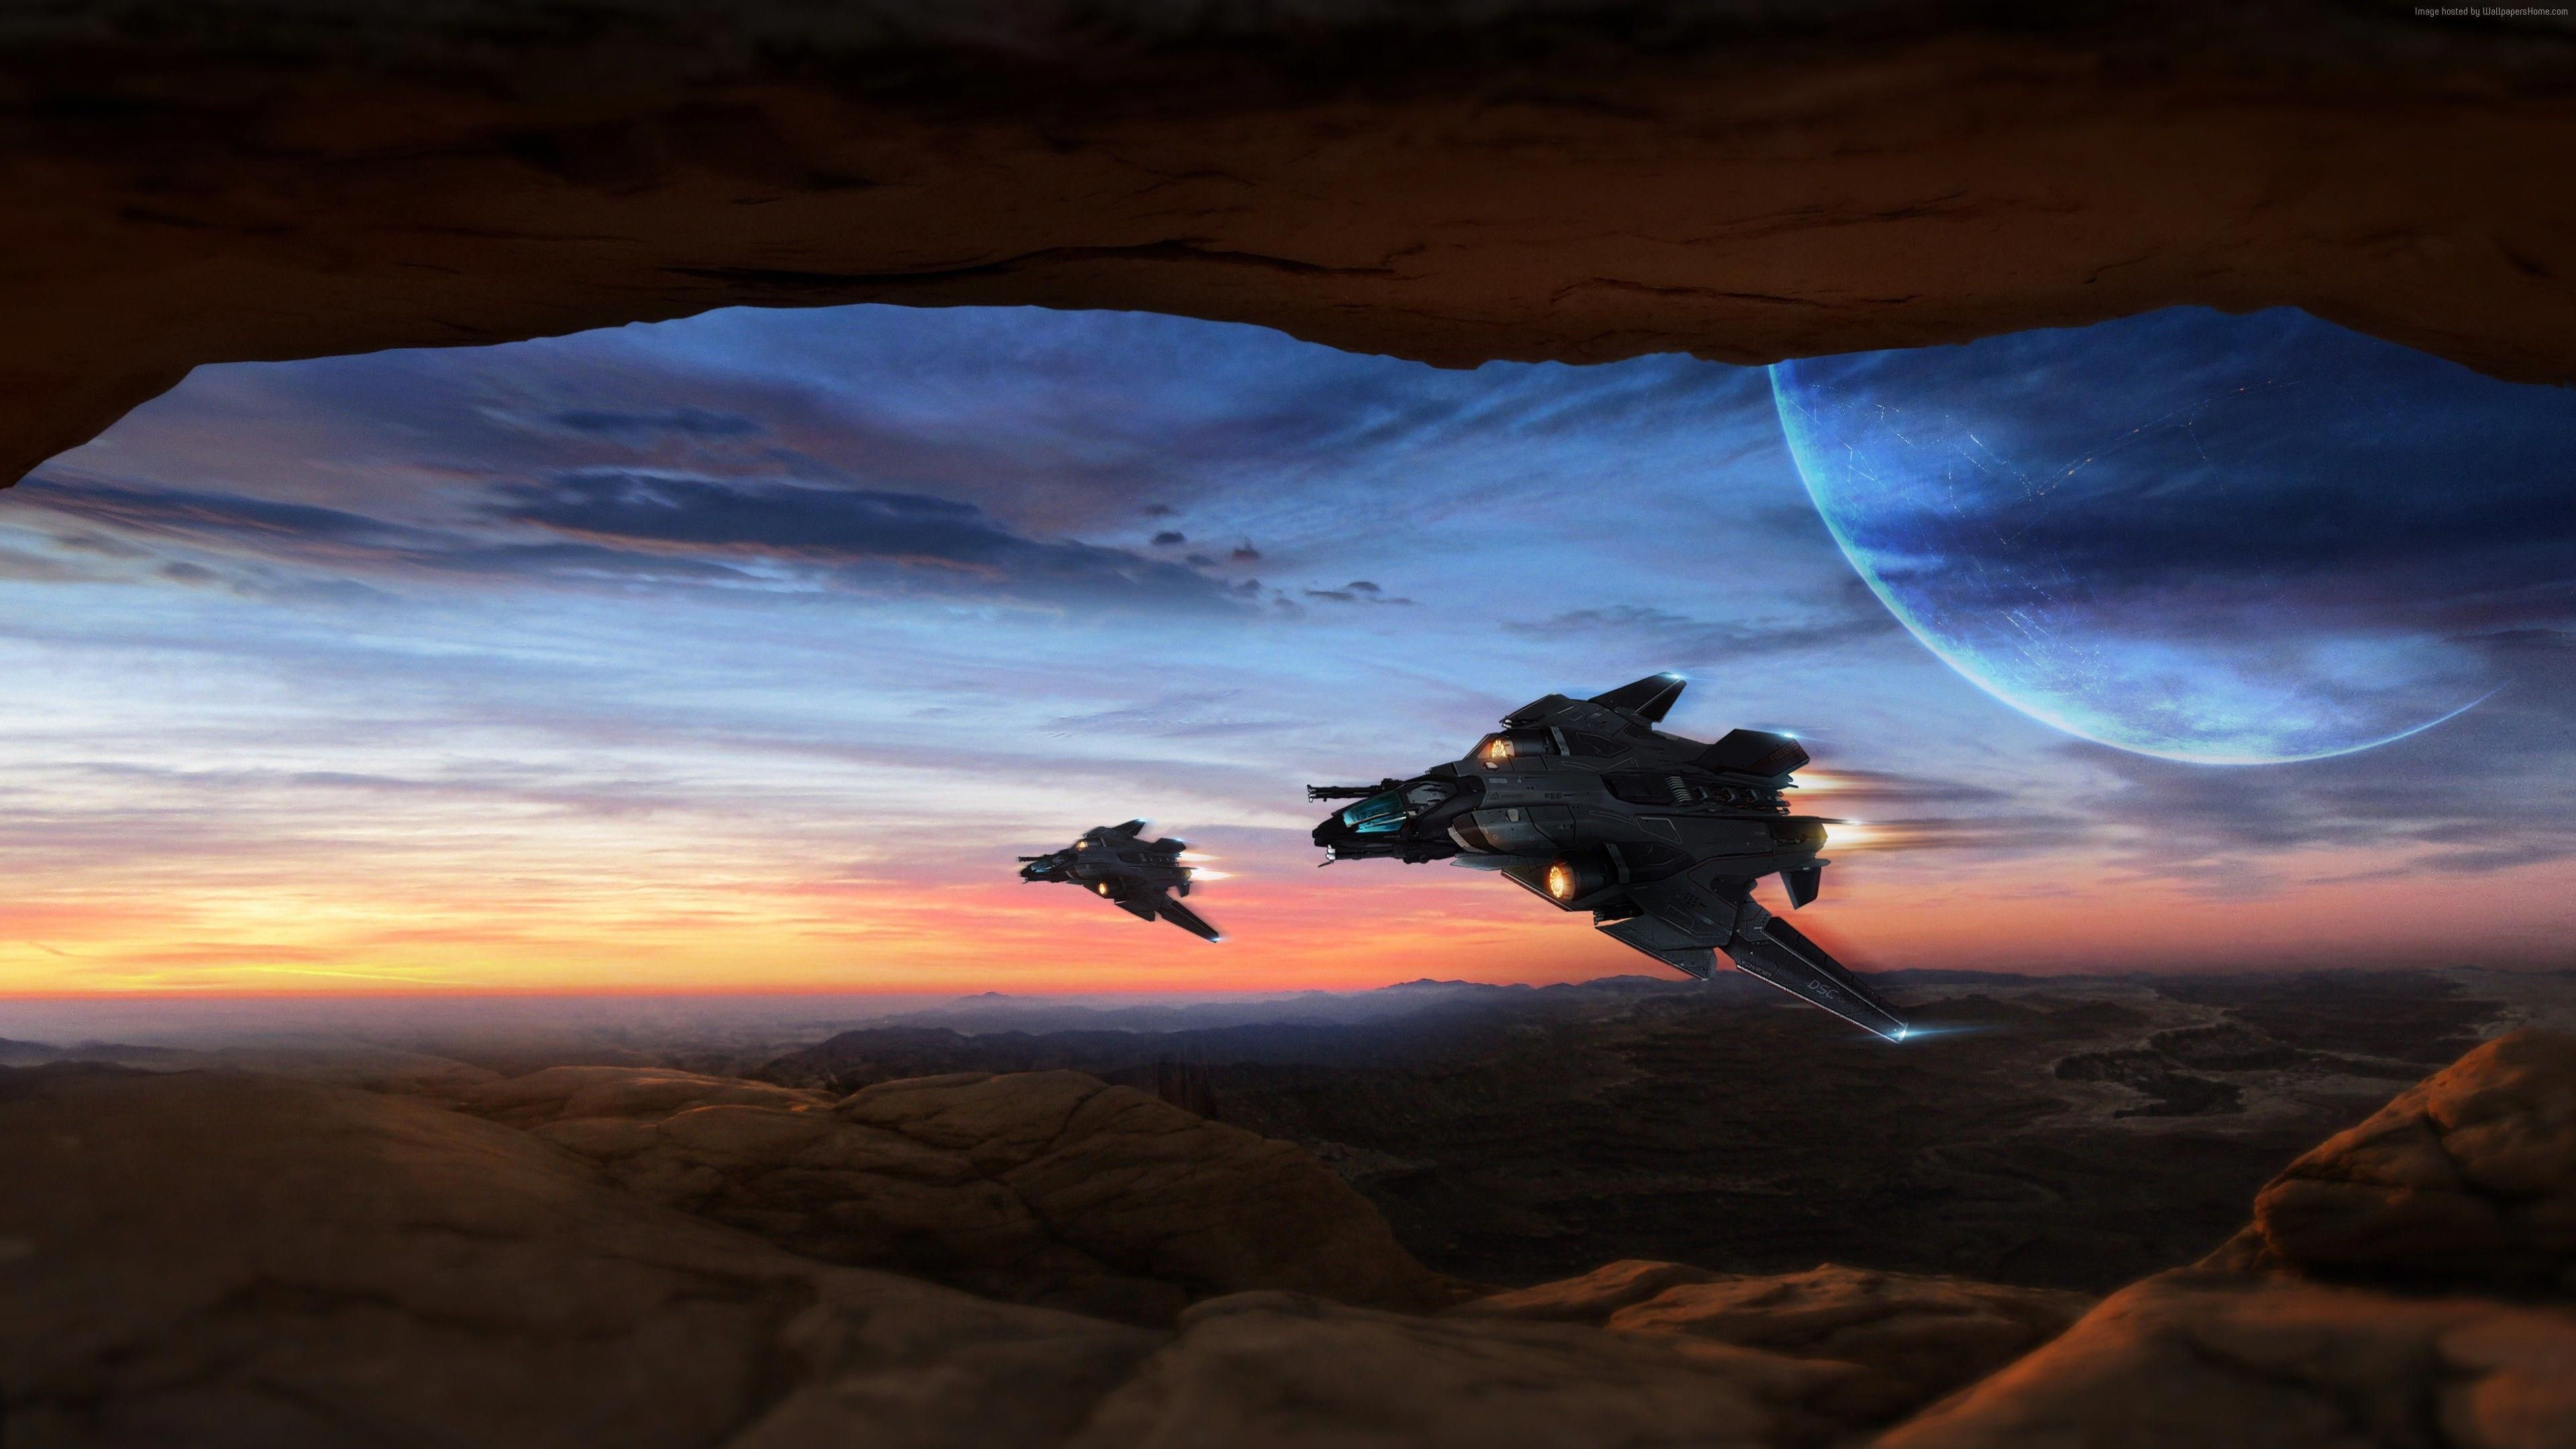 Motionless Star Citizen Polaris gameplaynaruto